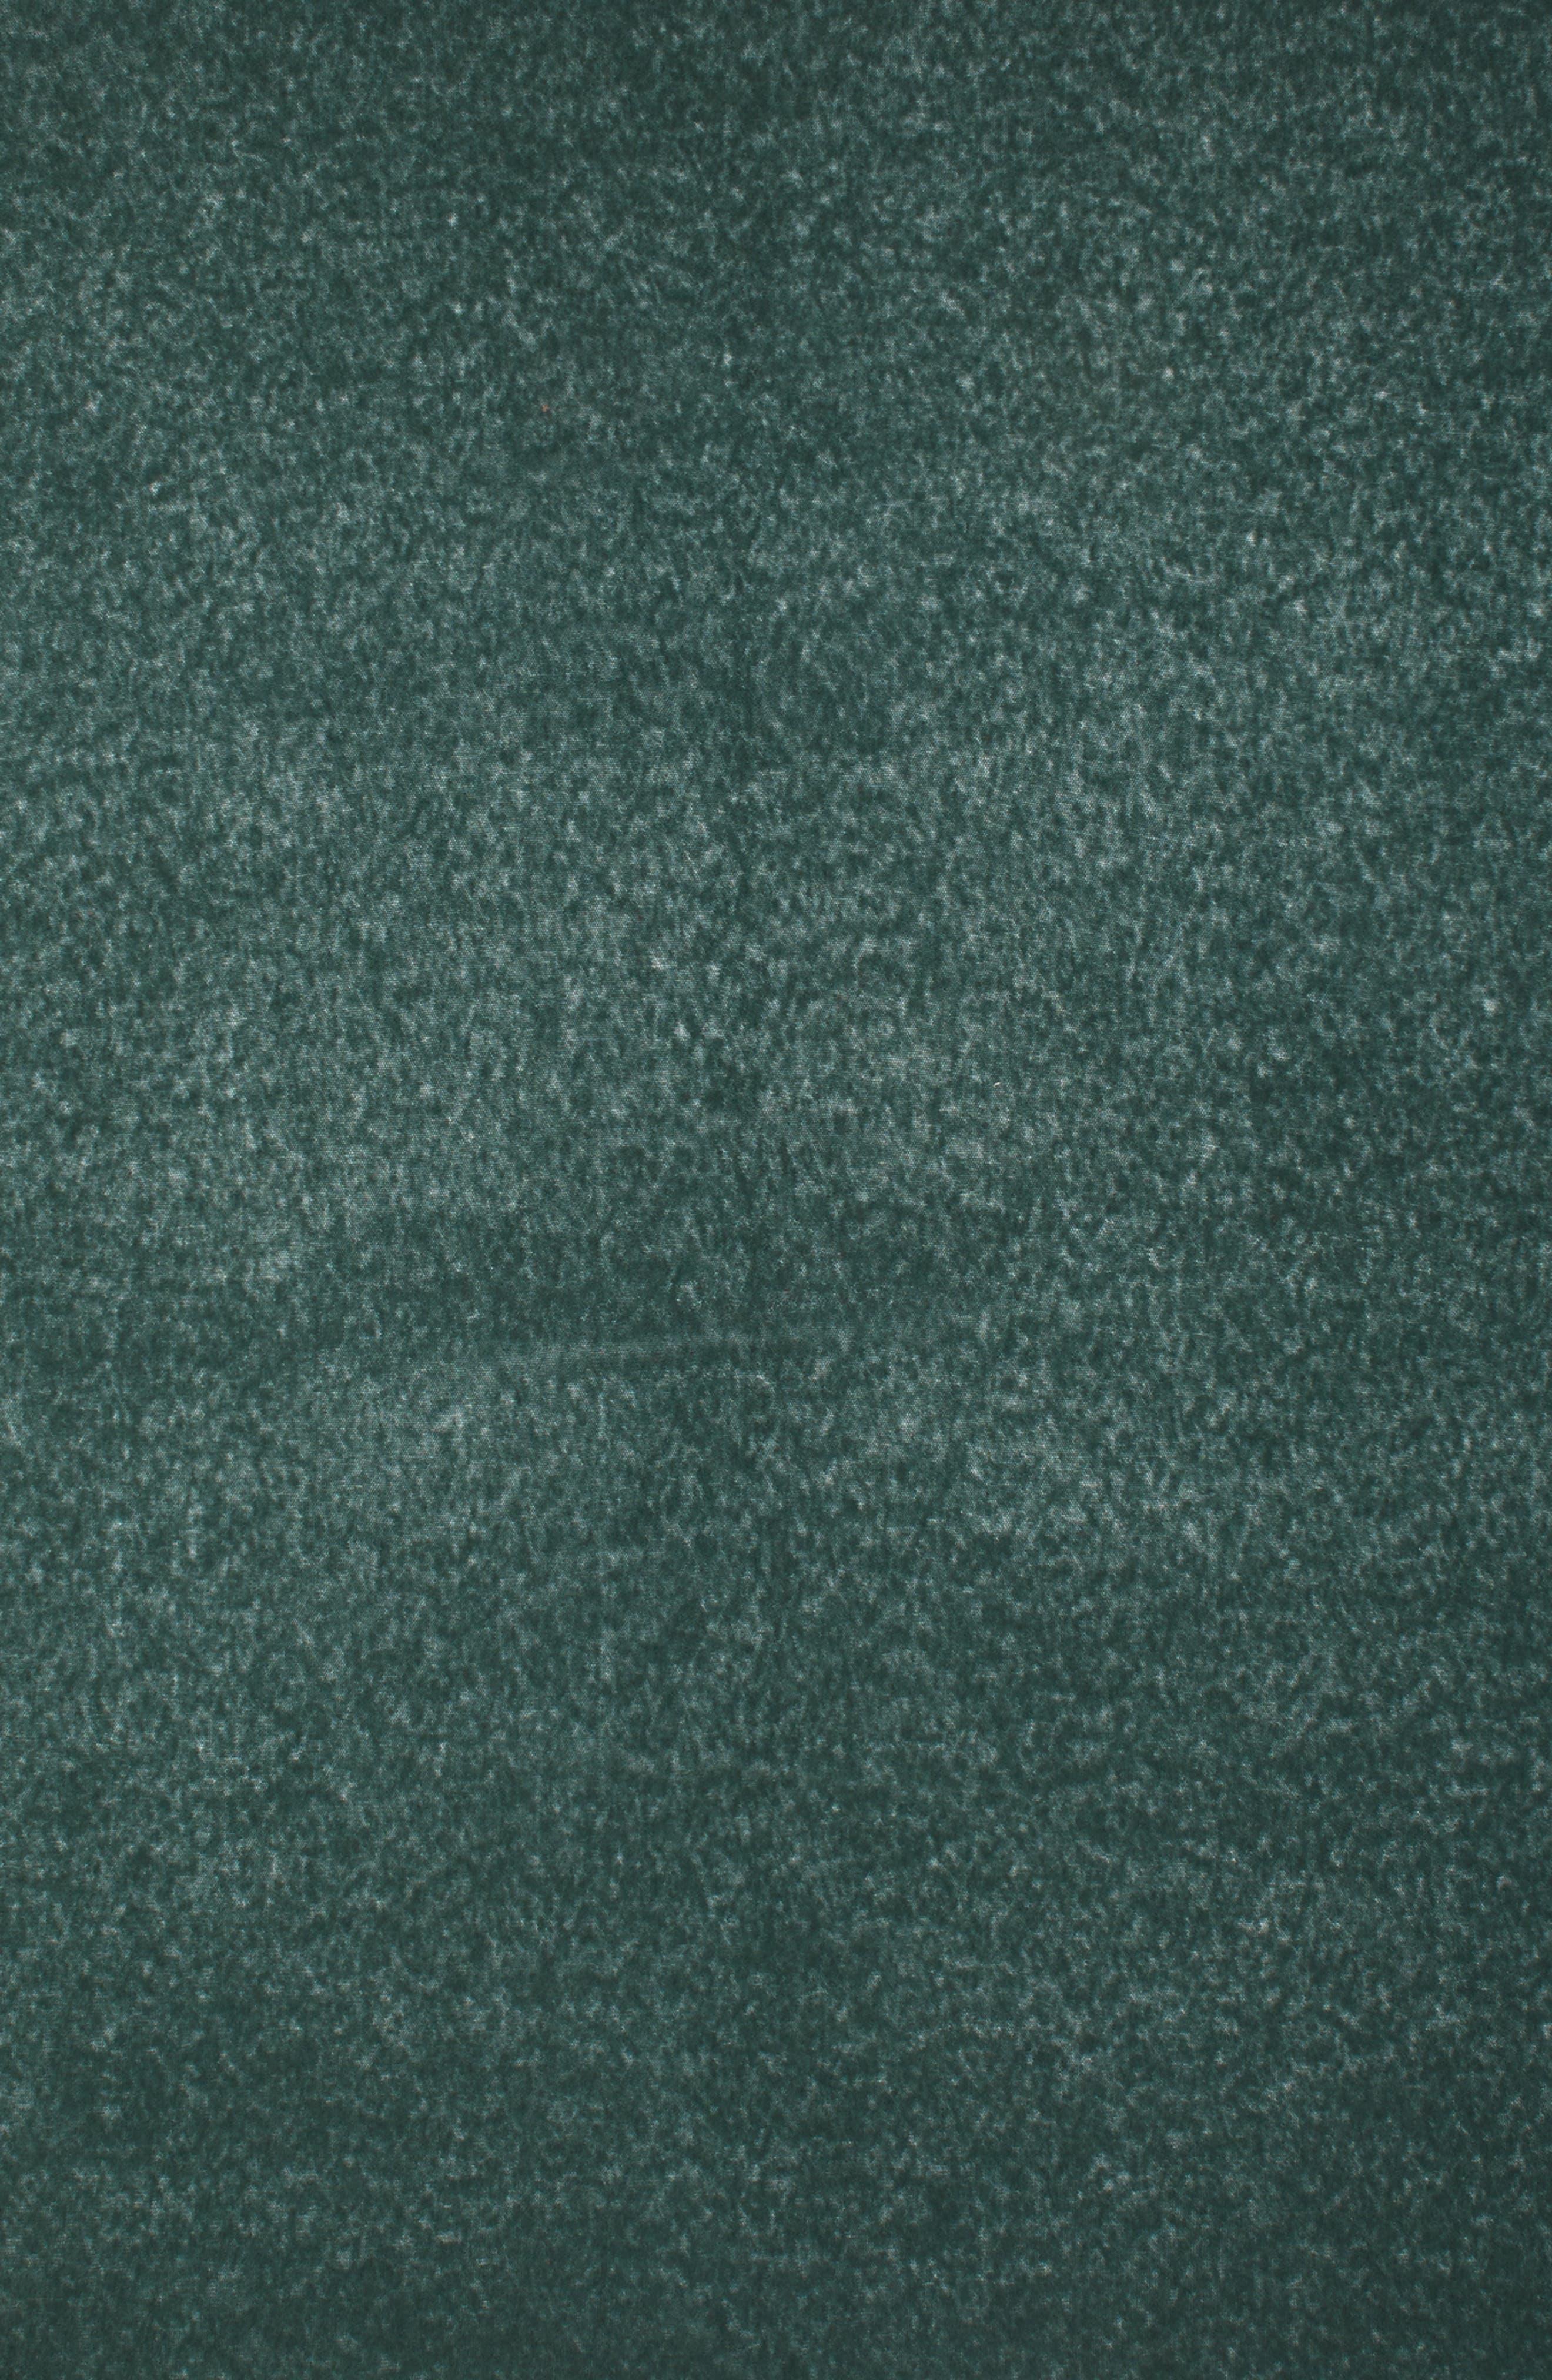 Cashmere Scarf,                             Alternate thumbnail 4, color,                             GREEN PONDEROSA